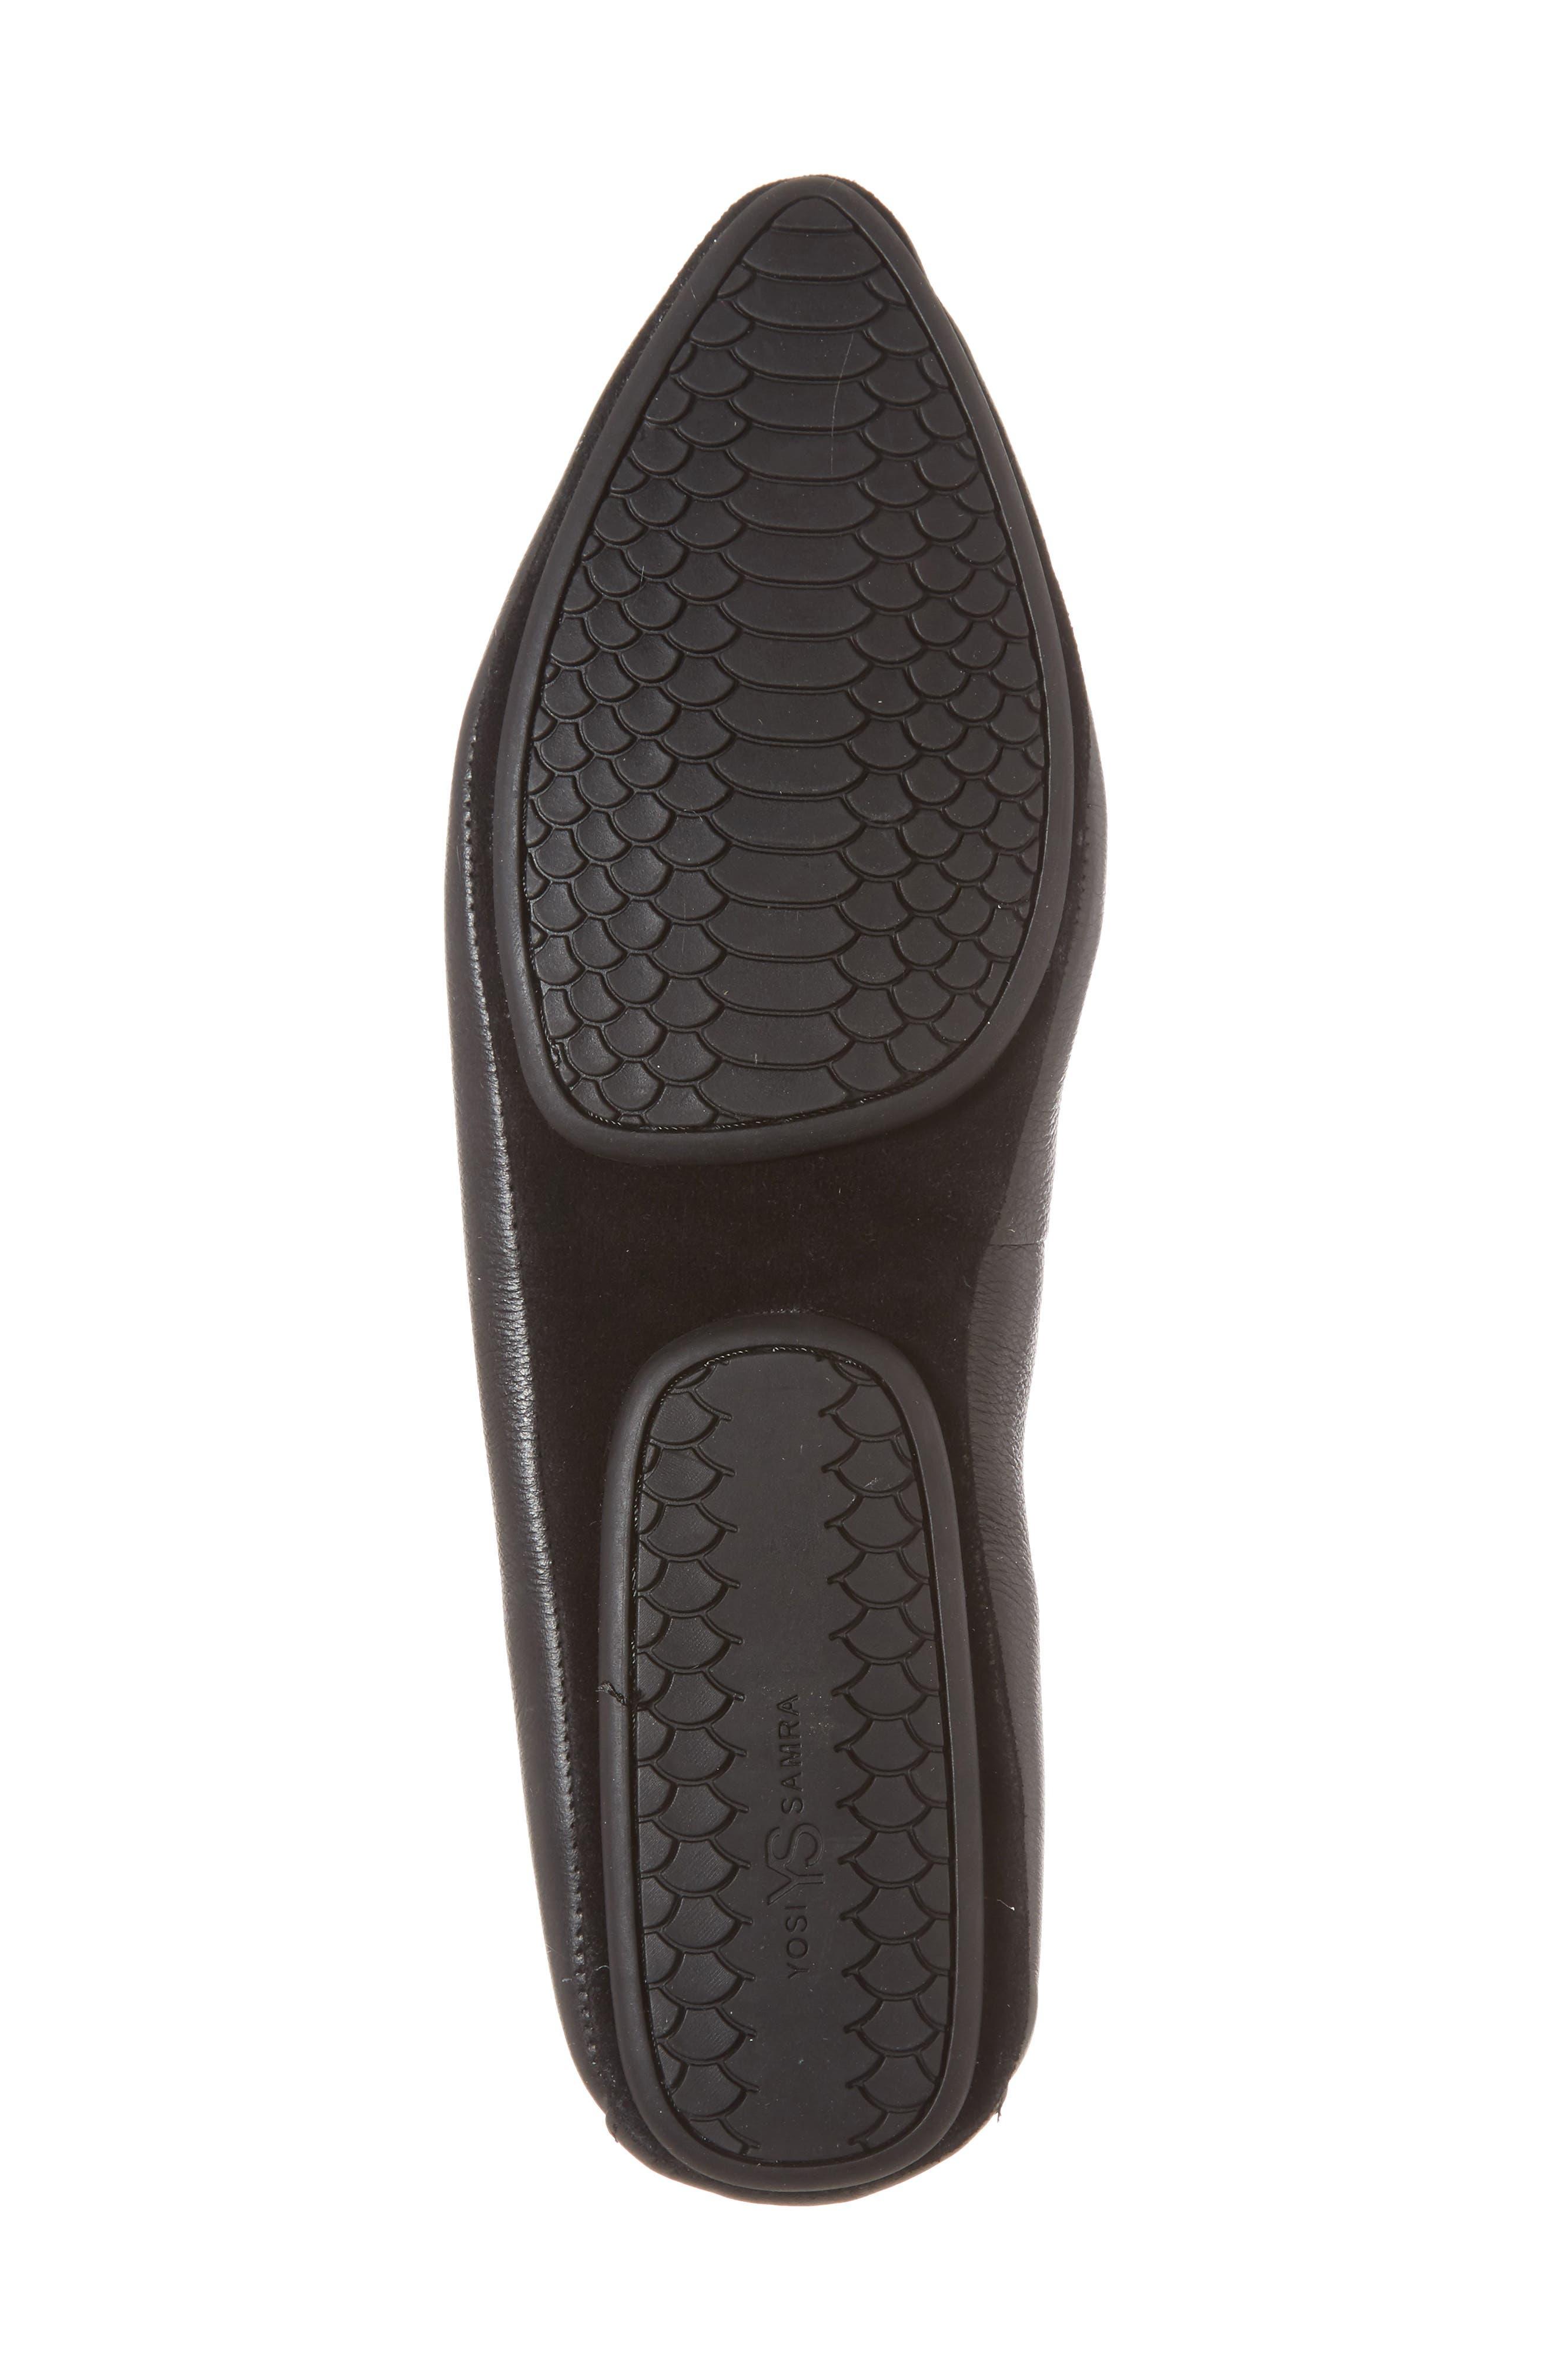 Vera Studded Loafer,                             Alternate thumbnail 6, color,                             Black/ Black Leather